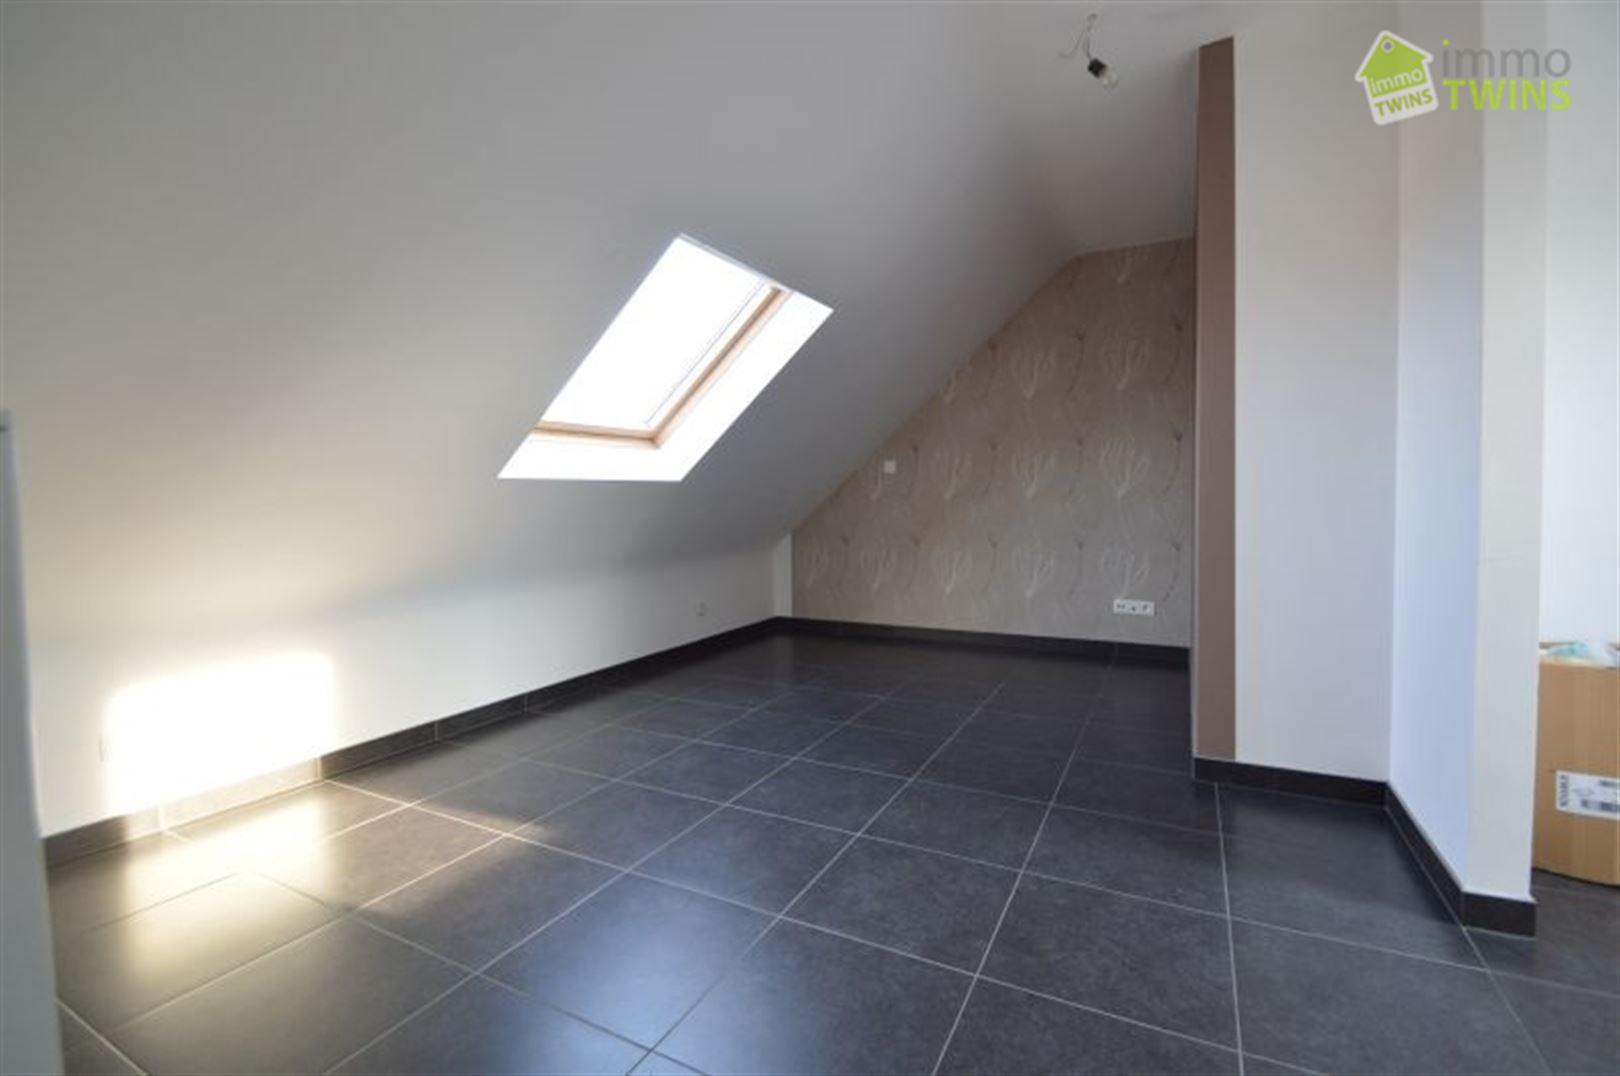 Foto 6 : Appartement te 9200 Baasrode (België) - Prijs € 660